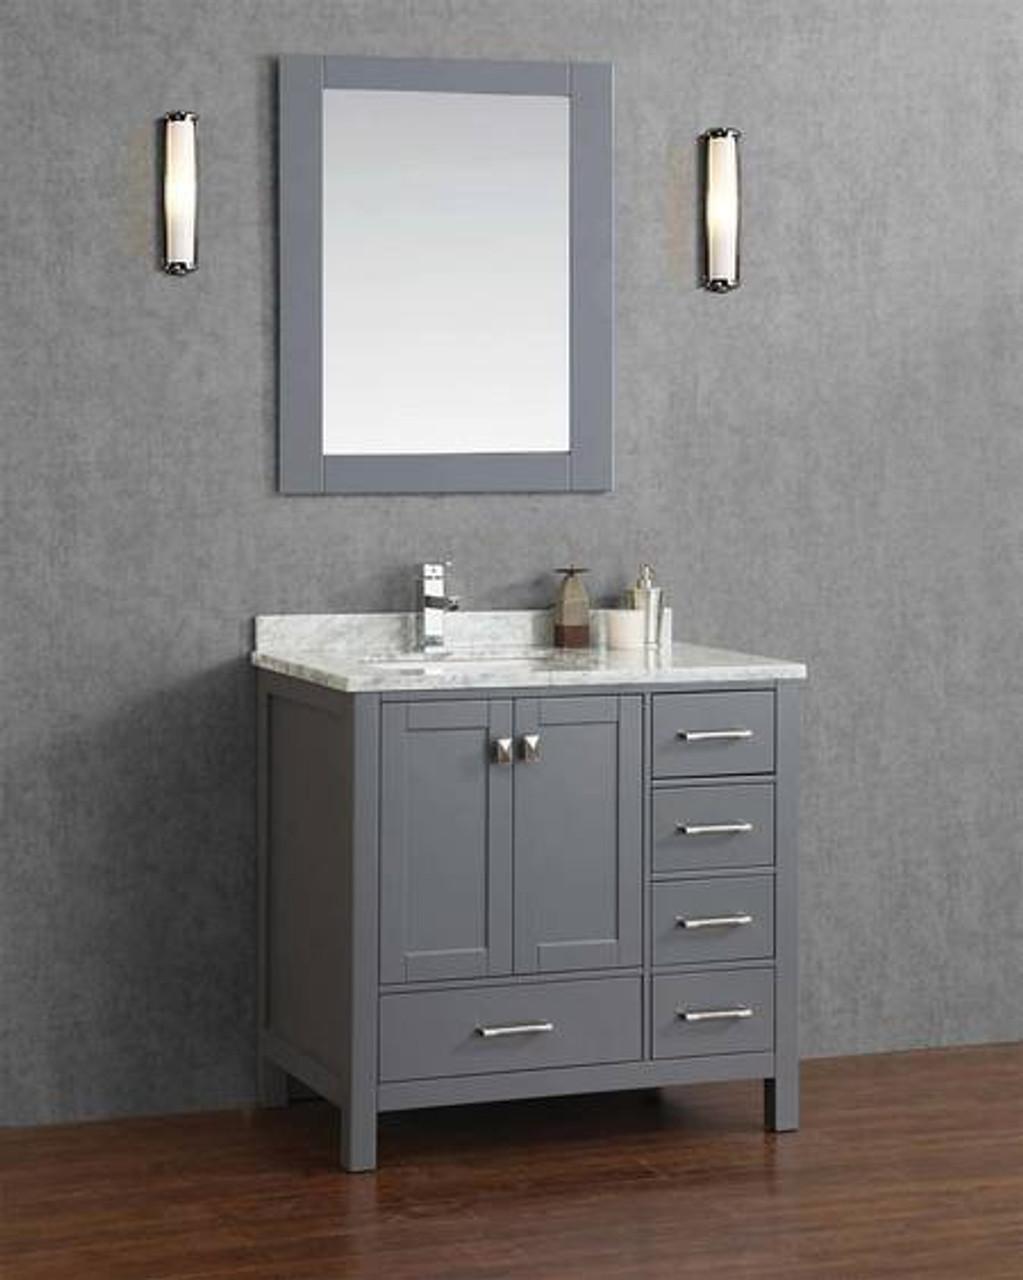 Armada 36 Bathroom Vanity Ice Grey York Taps